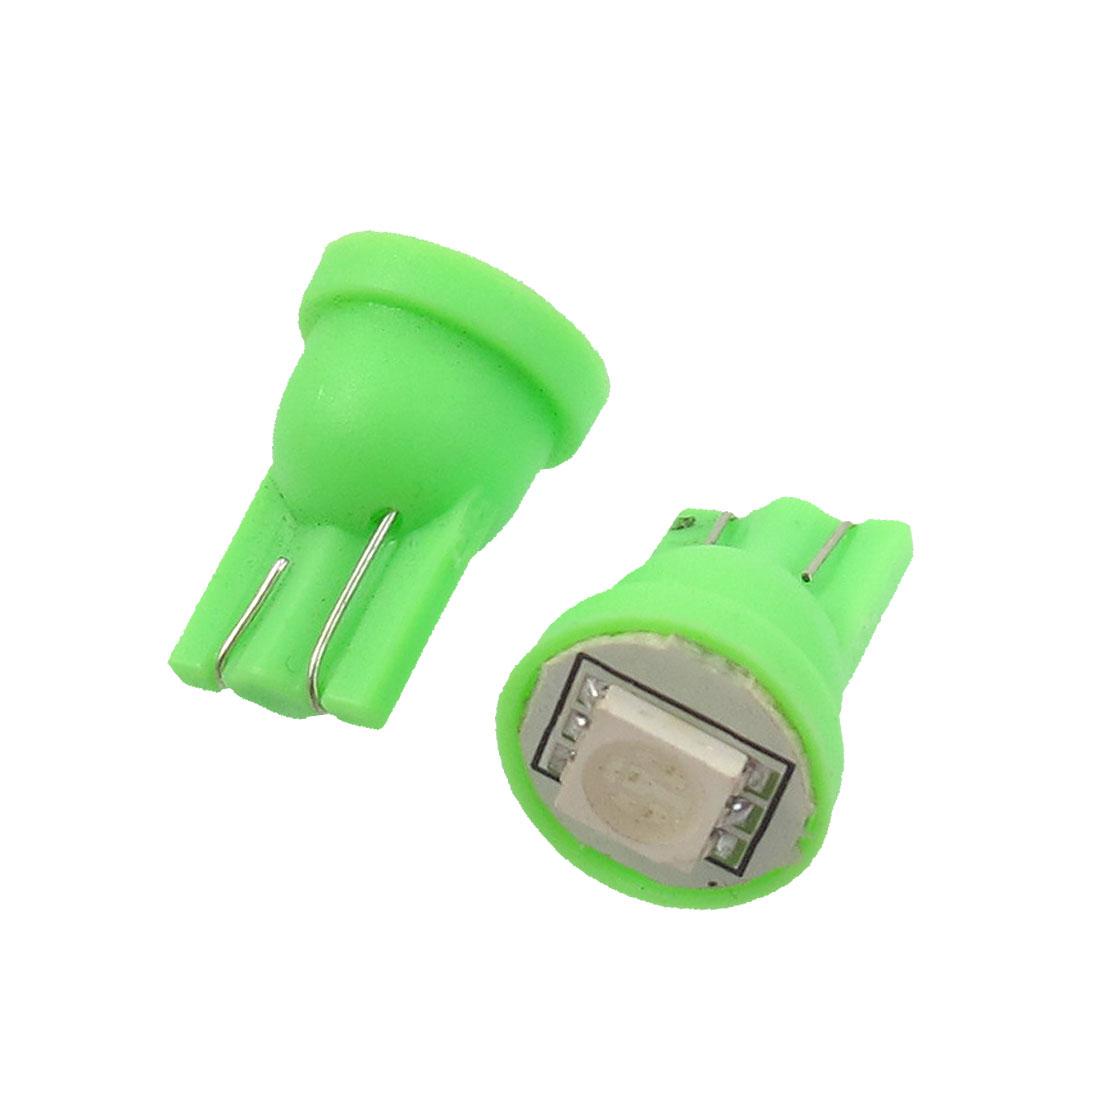 2-Pcs-T10-Wedge-Green-5050-SMD-LED-Brake-Side-Lamp-Bulbs-for-Car